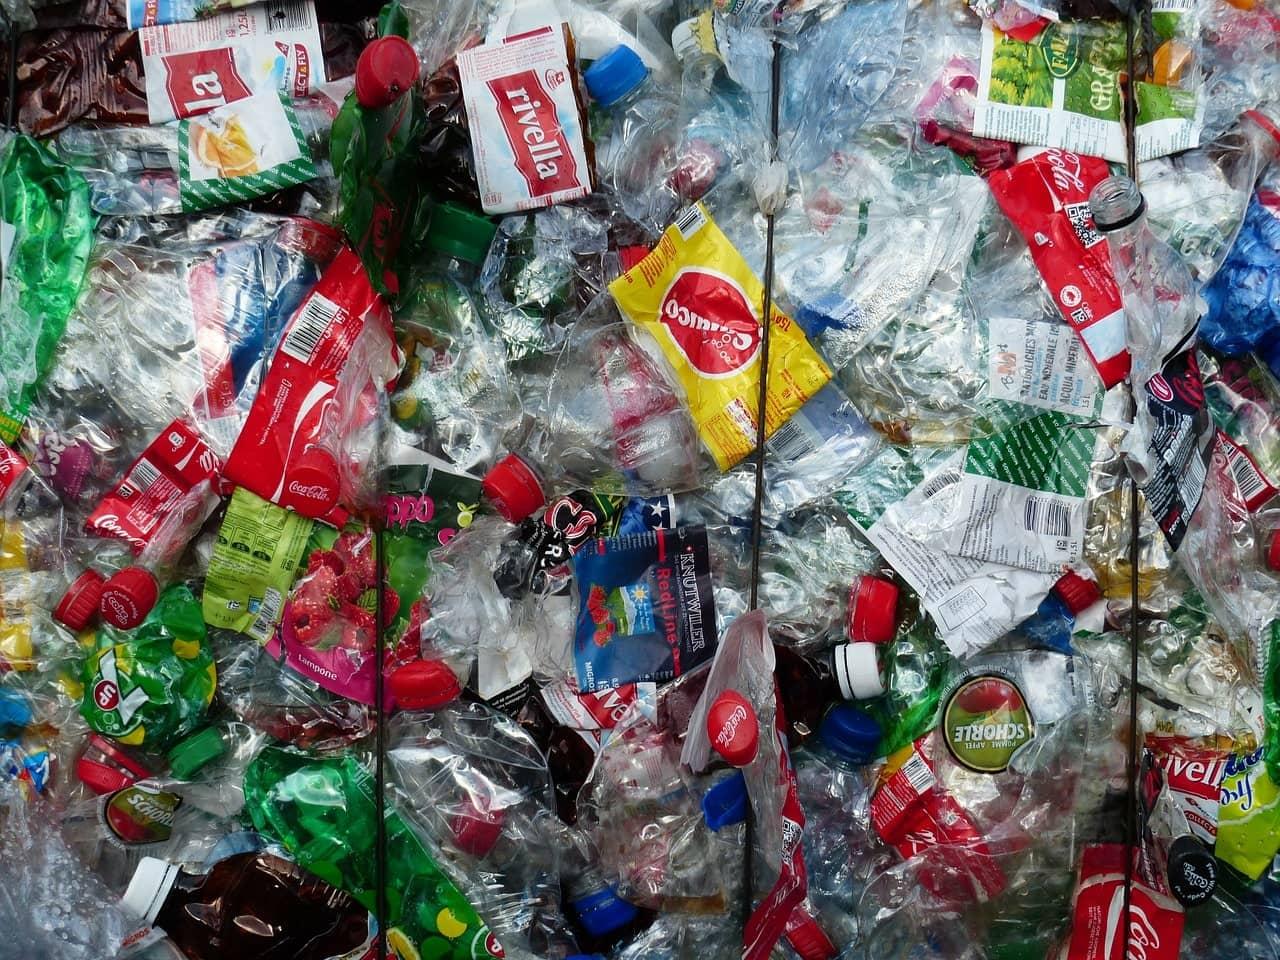 plastic-bottles-berliner-umschau-original-unverpackt